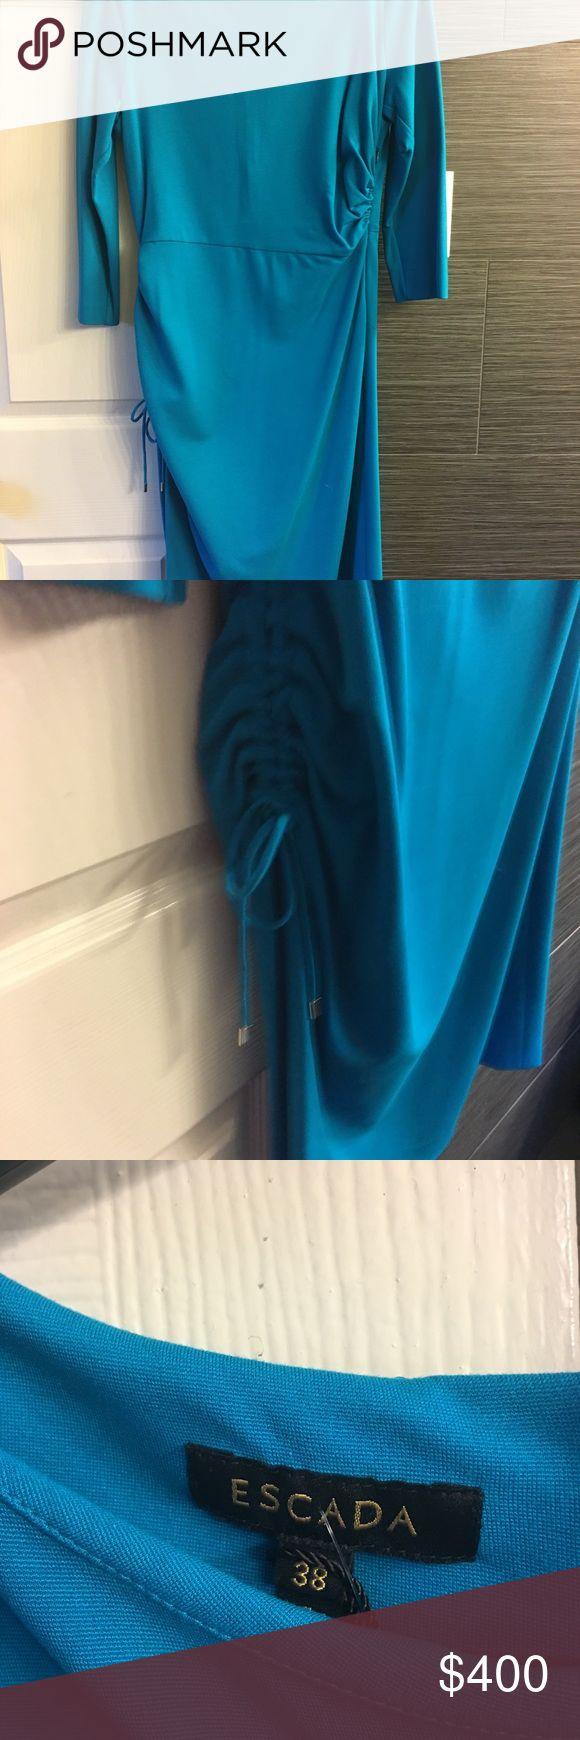 Escasa Dress New with tags Escada dress. Beautiful and elegant . European size 38 Escada Dresses